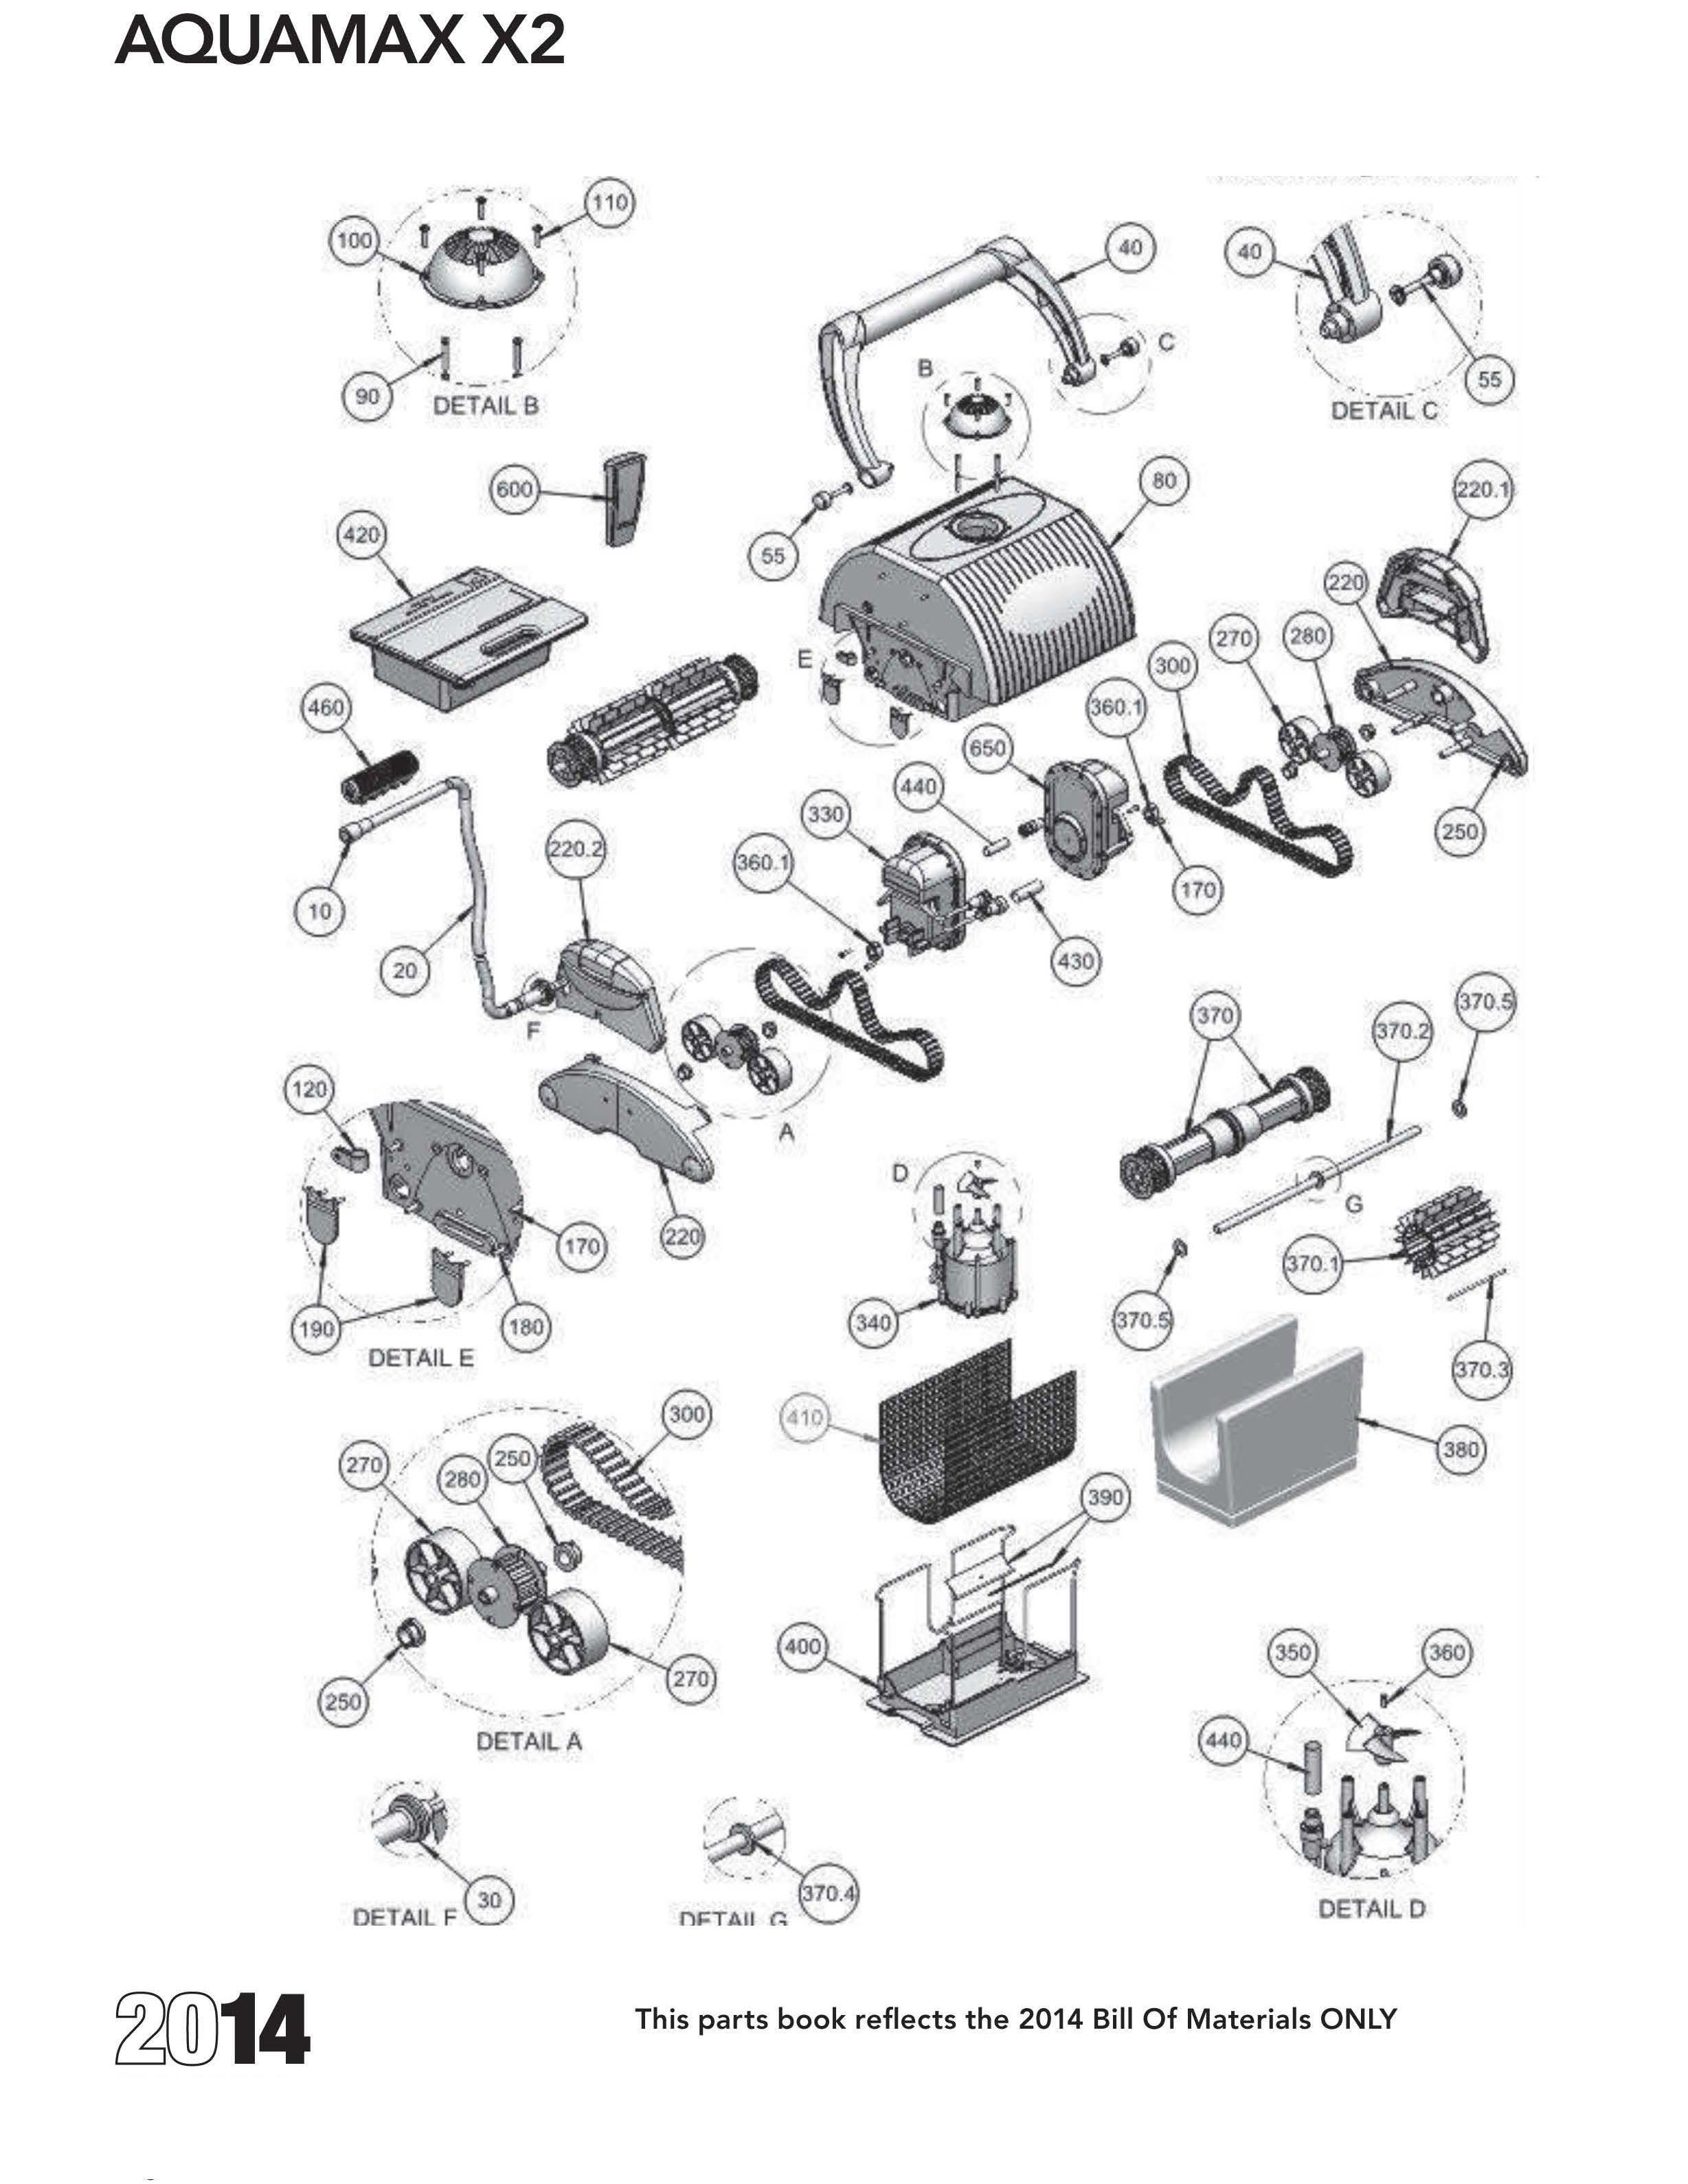 Aquamax X2 Diagram Amp Parts List